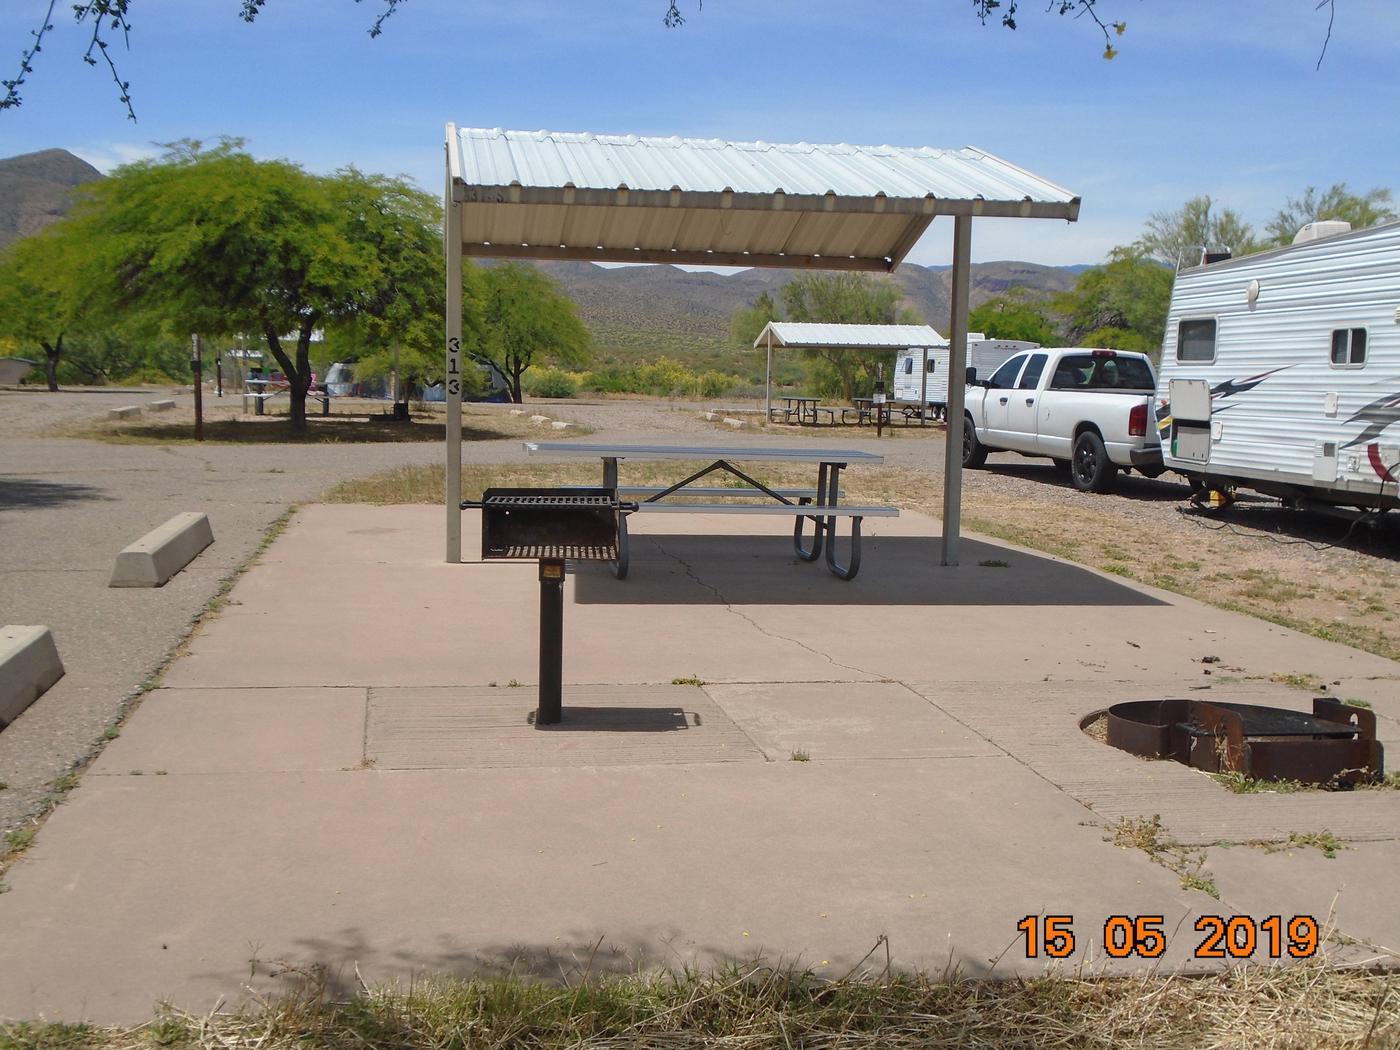 Campsite 313Windy Hill Campground